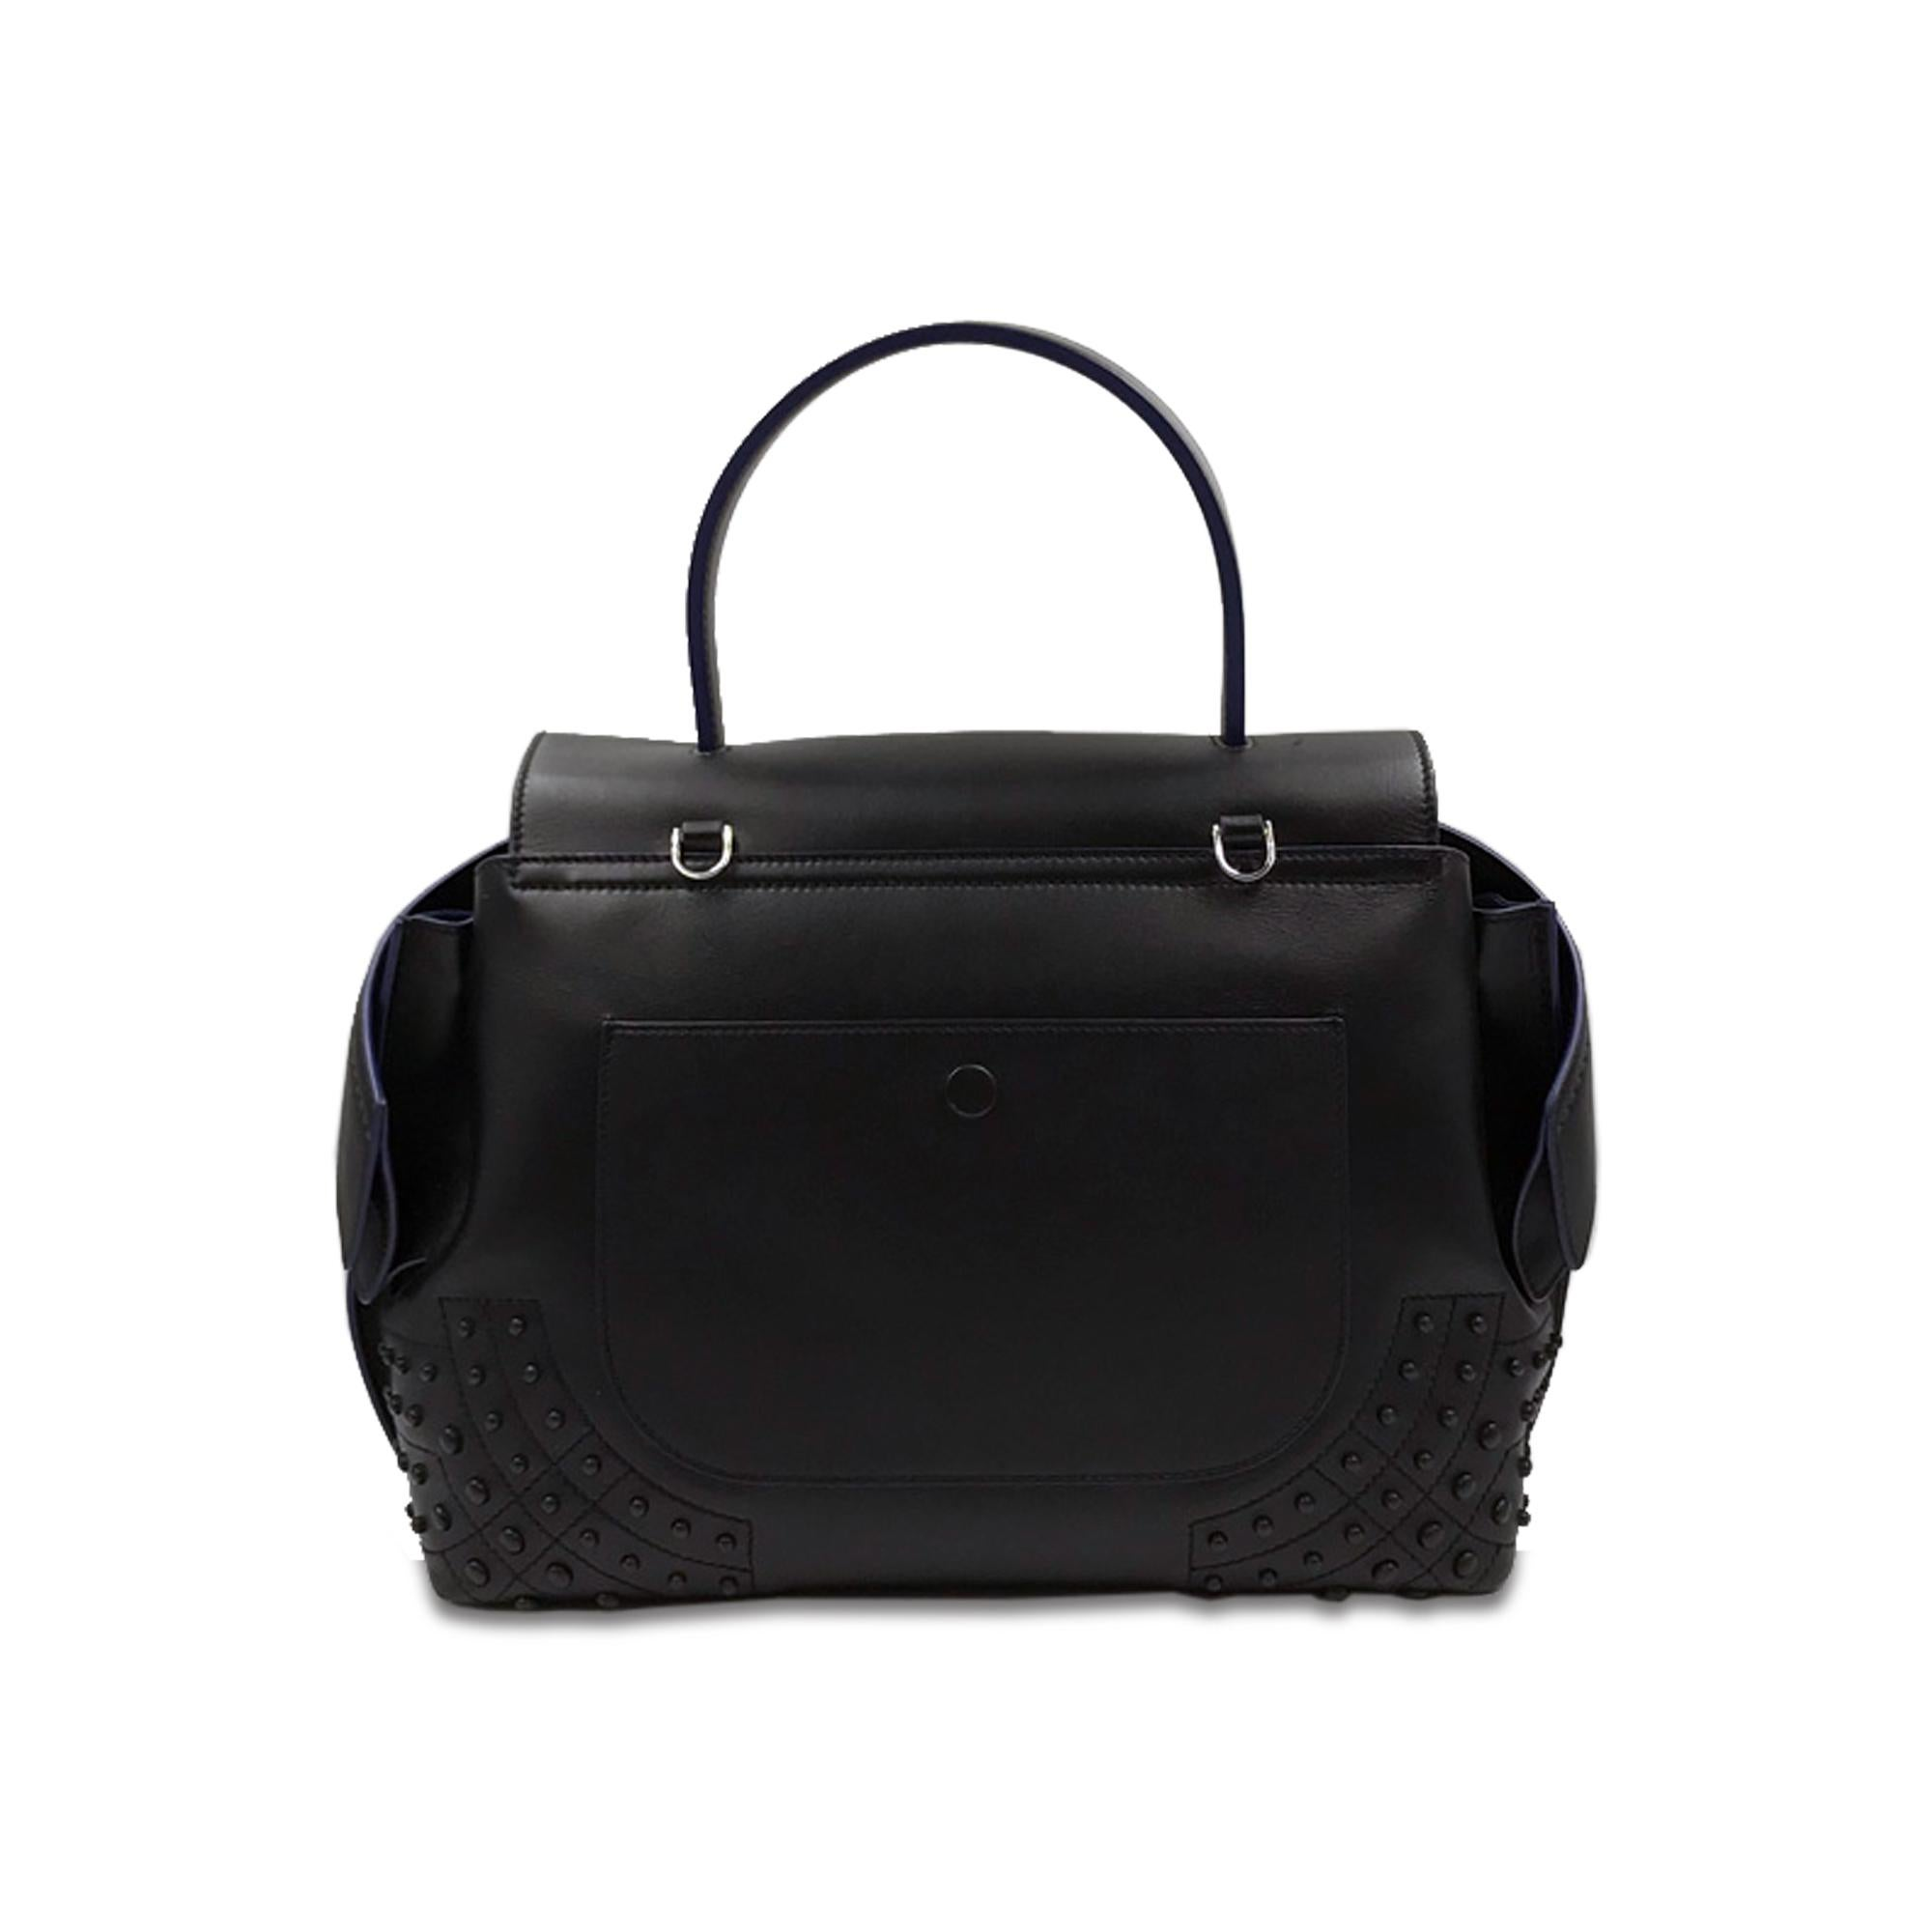 f277b60f6d6 Tod's Wave Mini Gommini Black Leather Satchel Ladies Handbag XBWAMRWG201  For Sale at 1stdibs